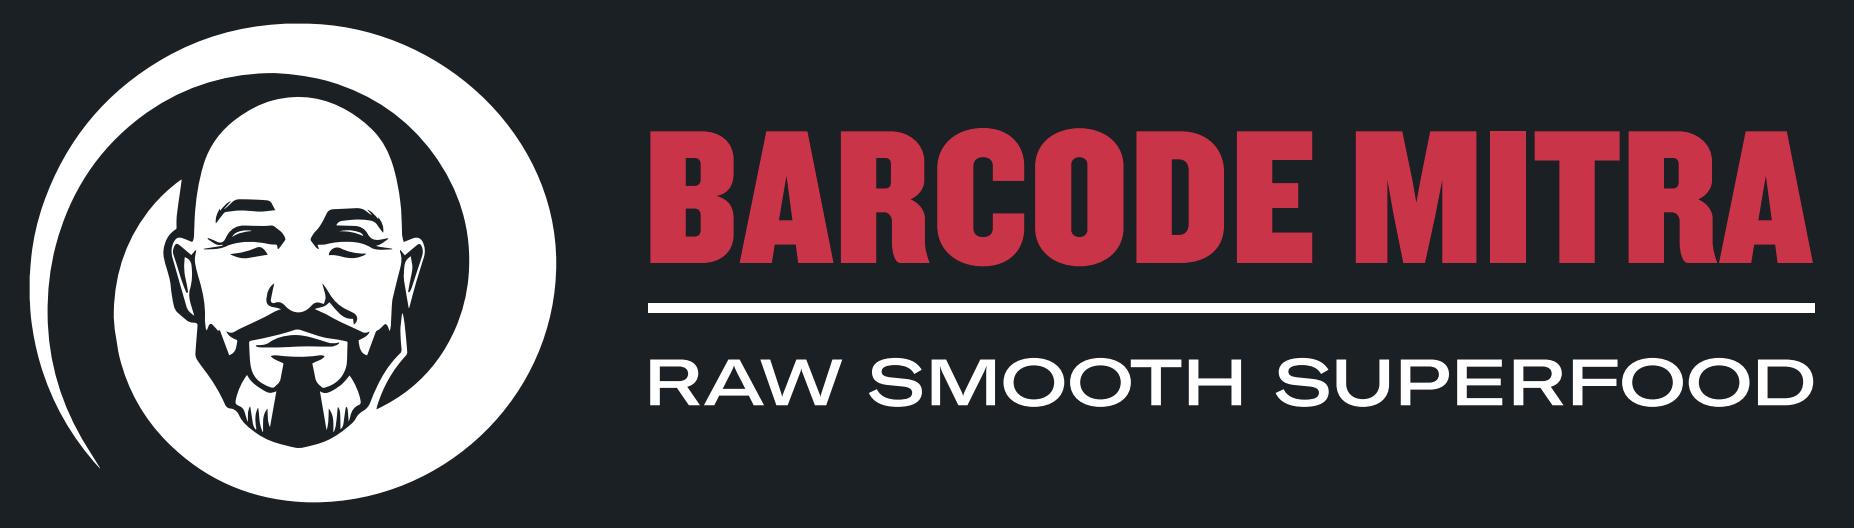 barcode mitra logo